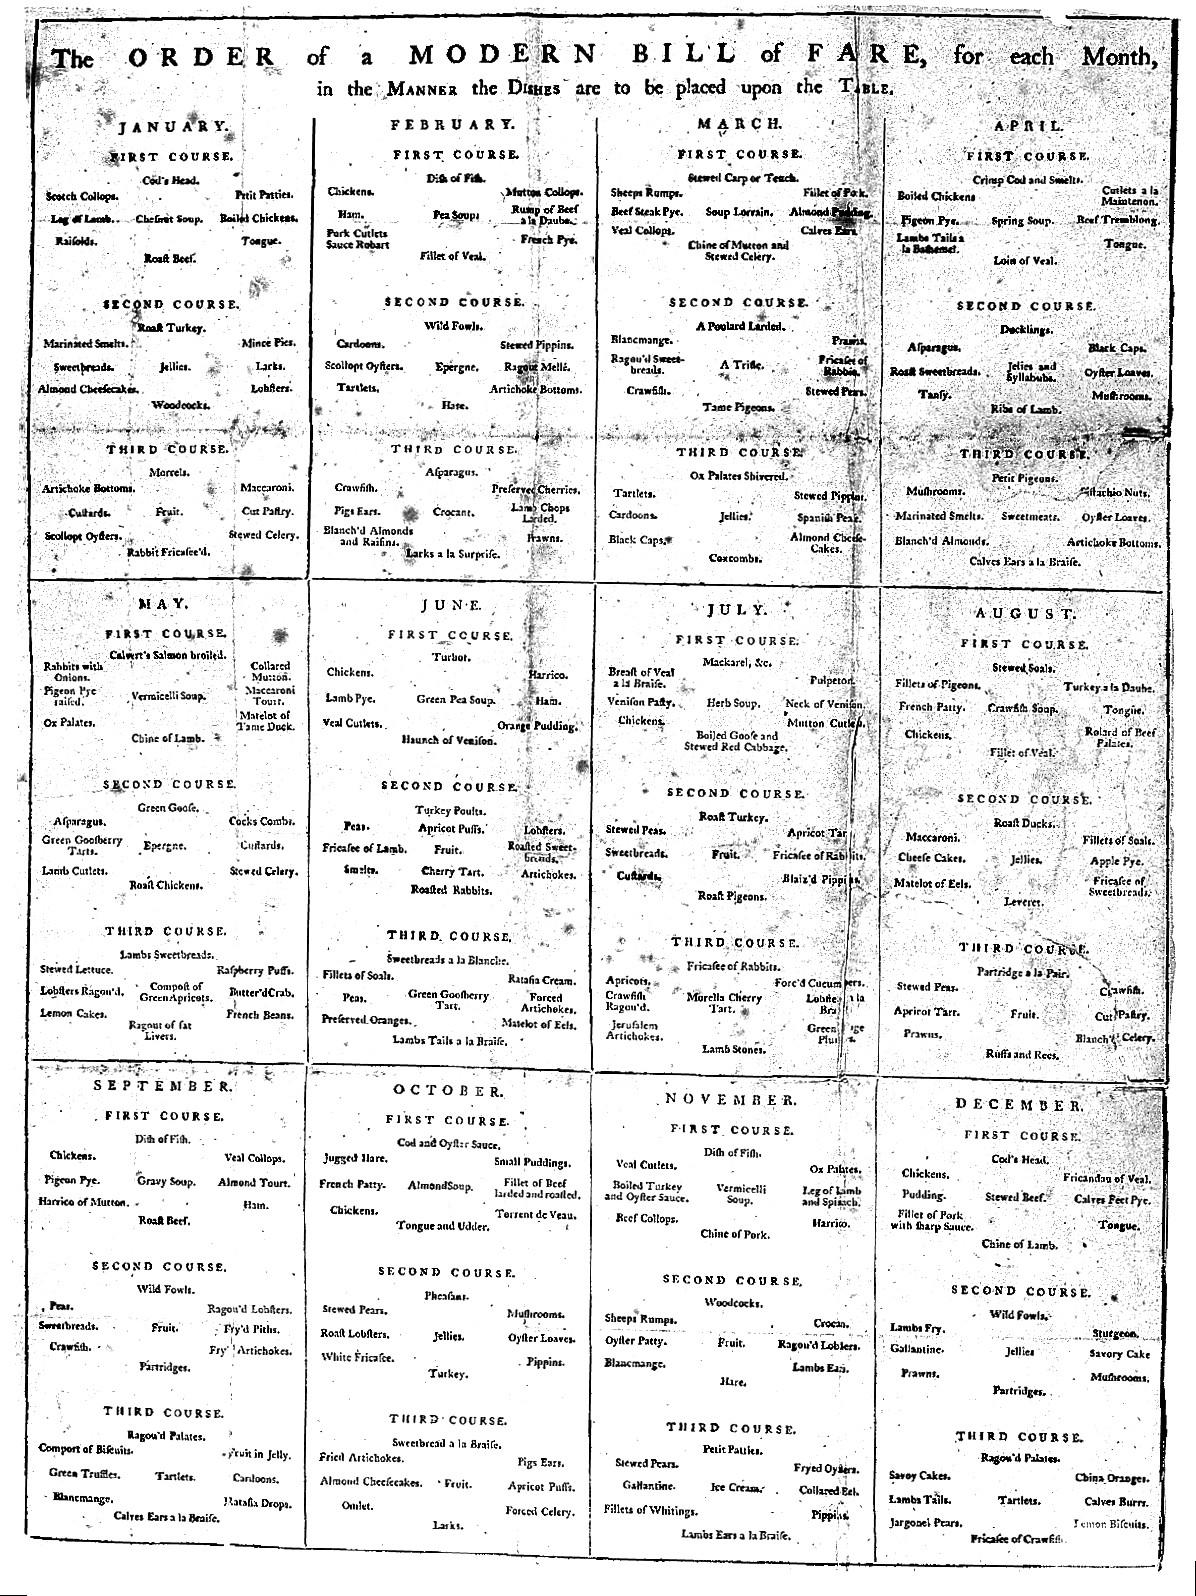 Paper Weights Chart: Chart; menu 7The Order of a modern bill of fare7. Wellcome ,Chart